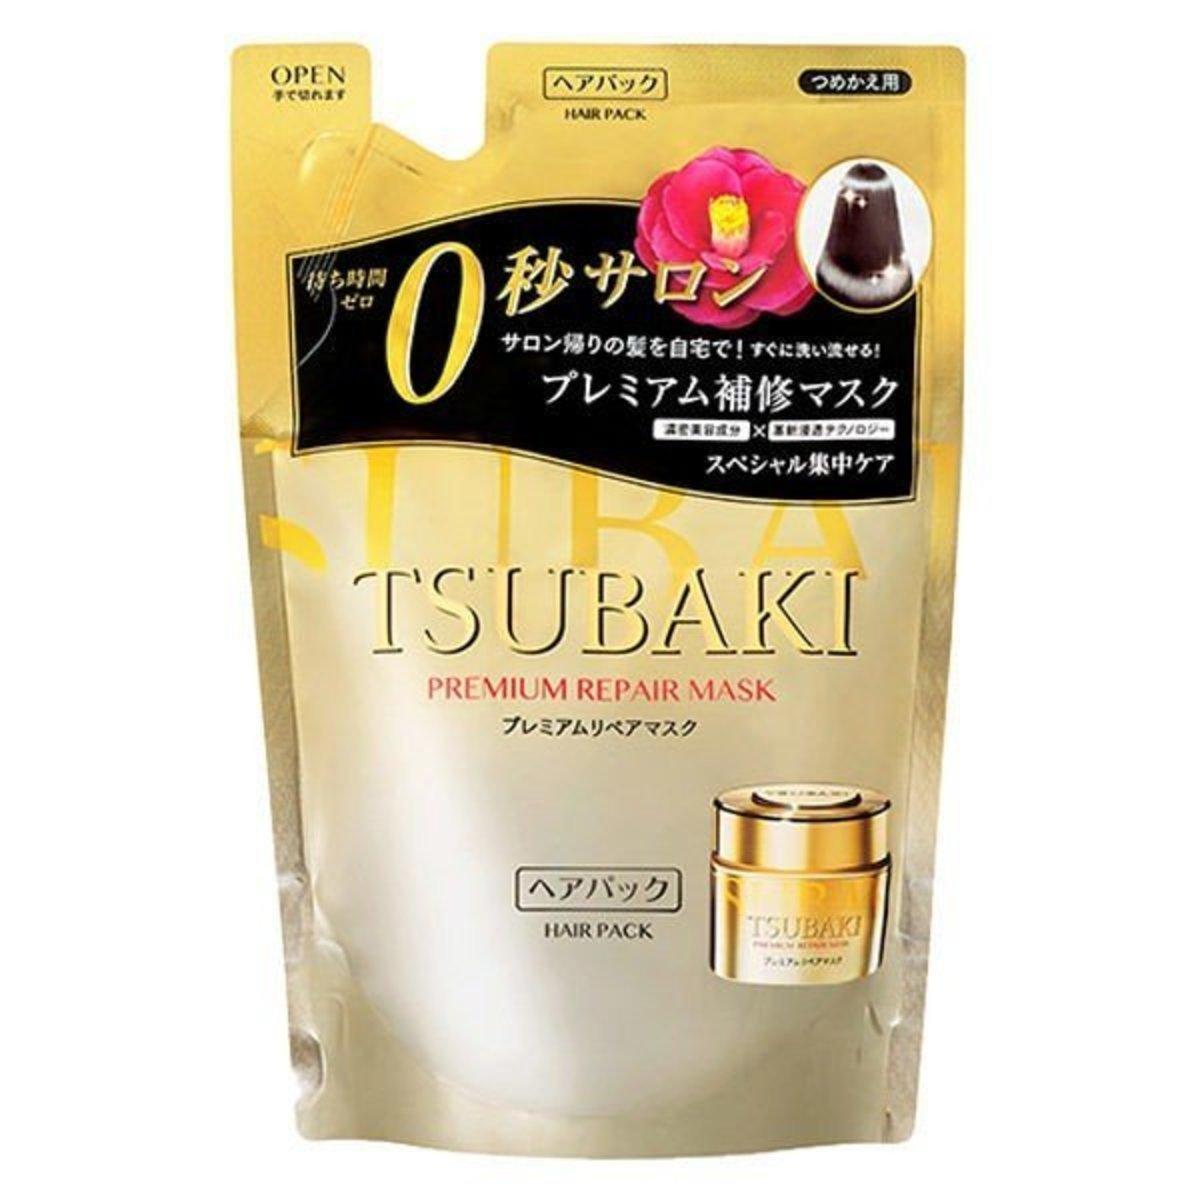 Tsubaki Repair Zero Second Salon Hair Repair Cream 150g